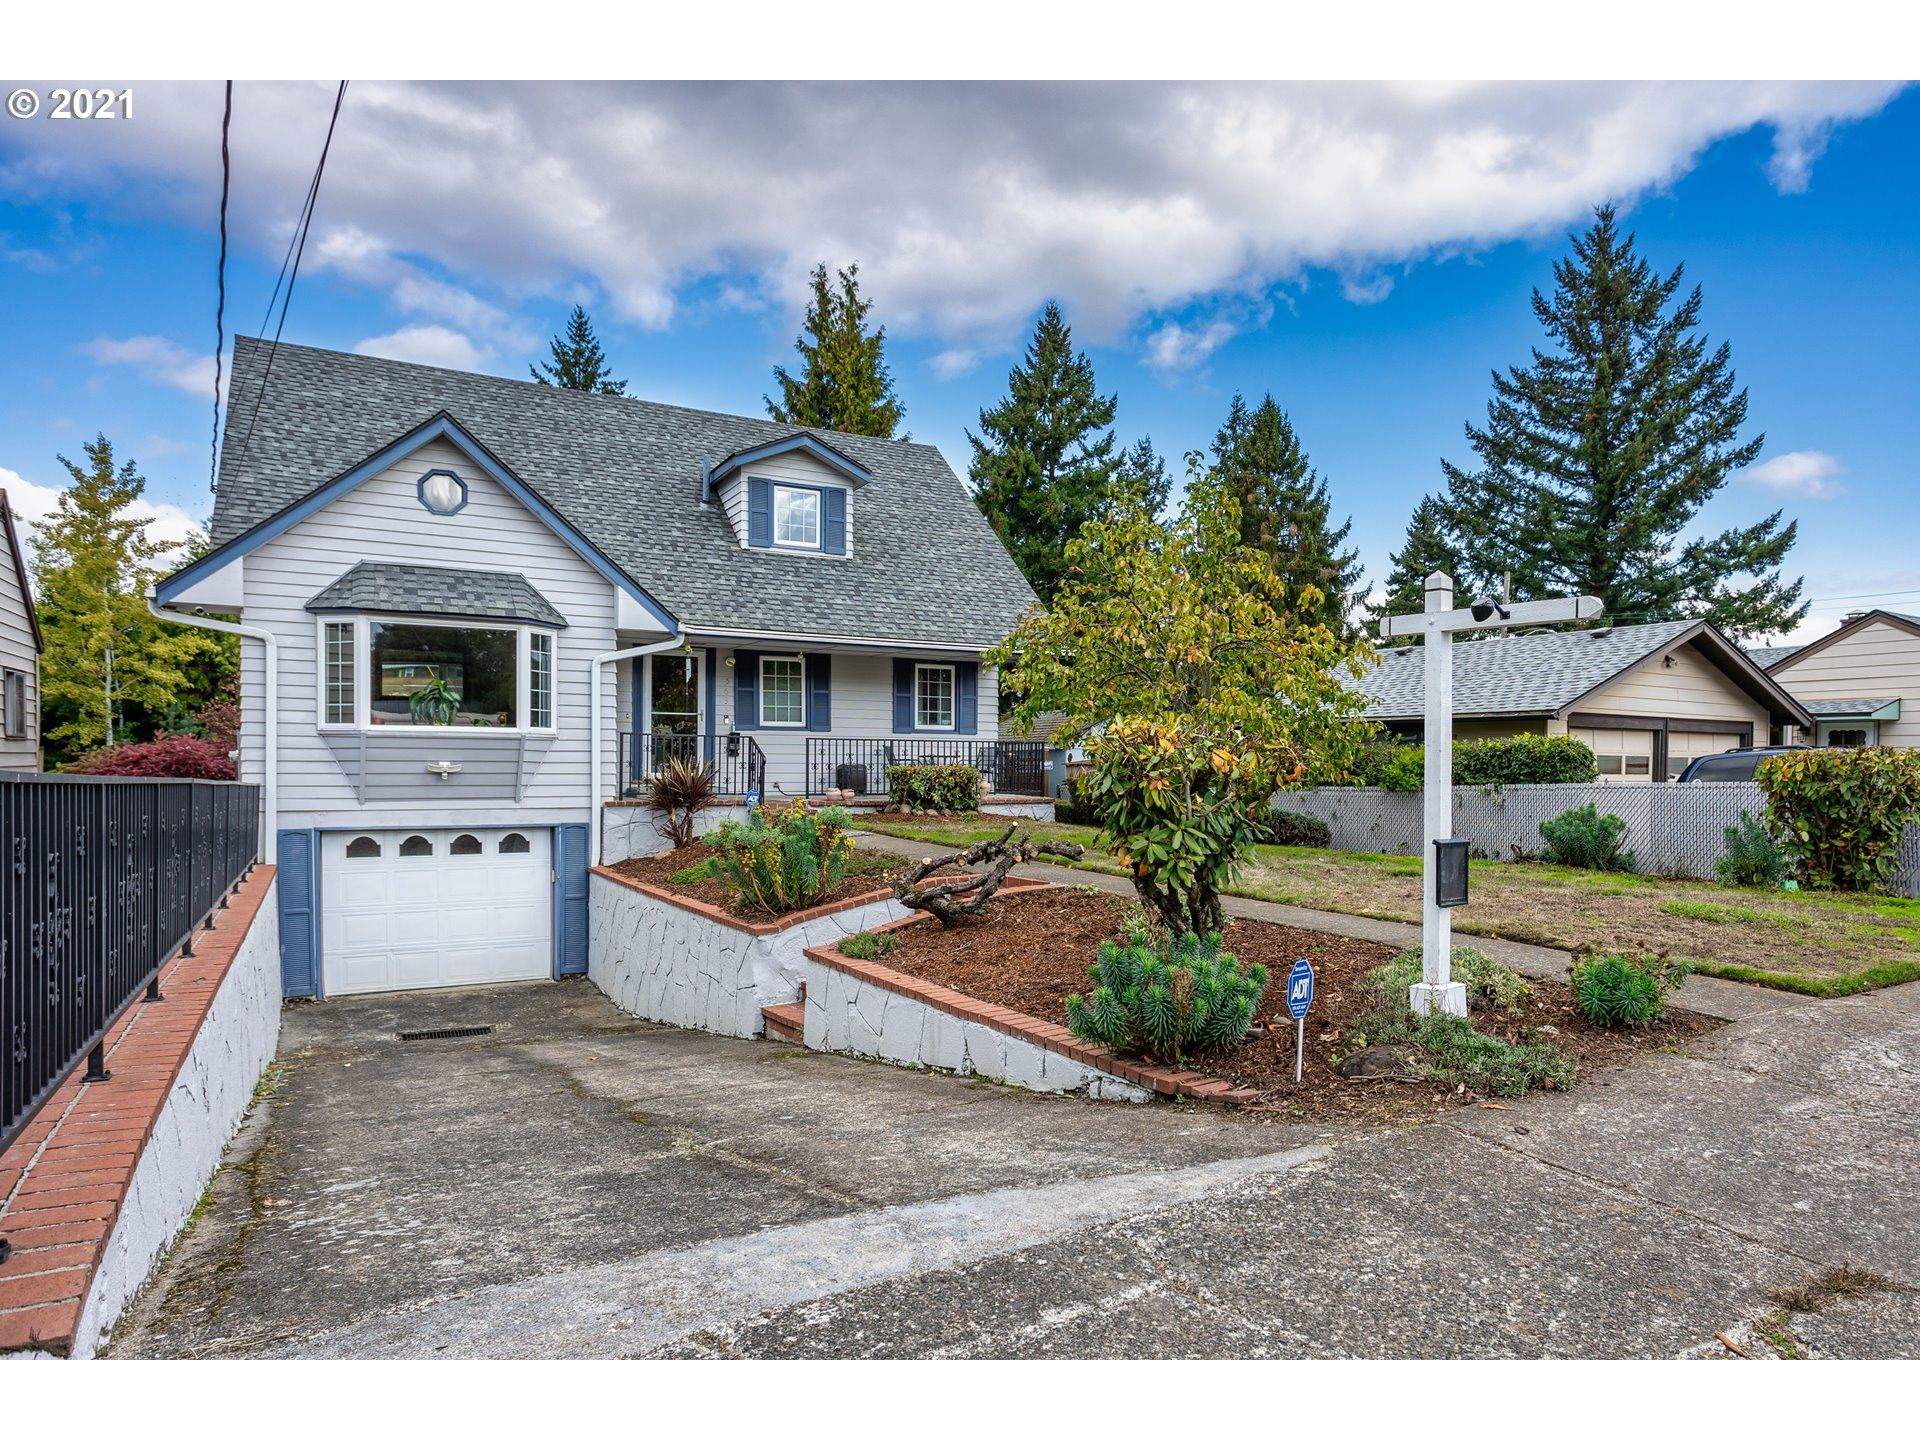 5635 NE WYGANT ST, Portland, OR 97218 - MLS#: 21274358